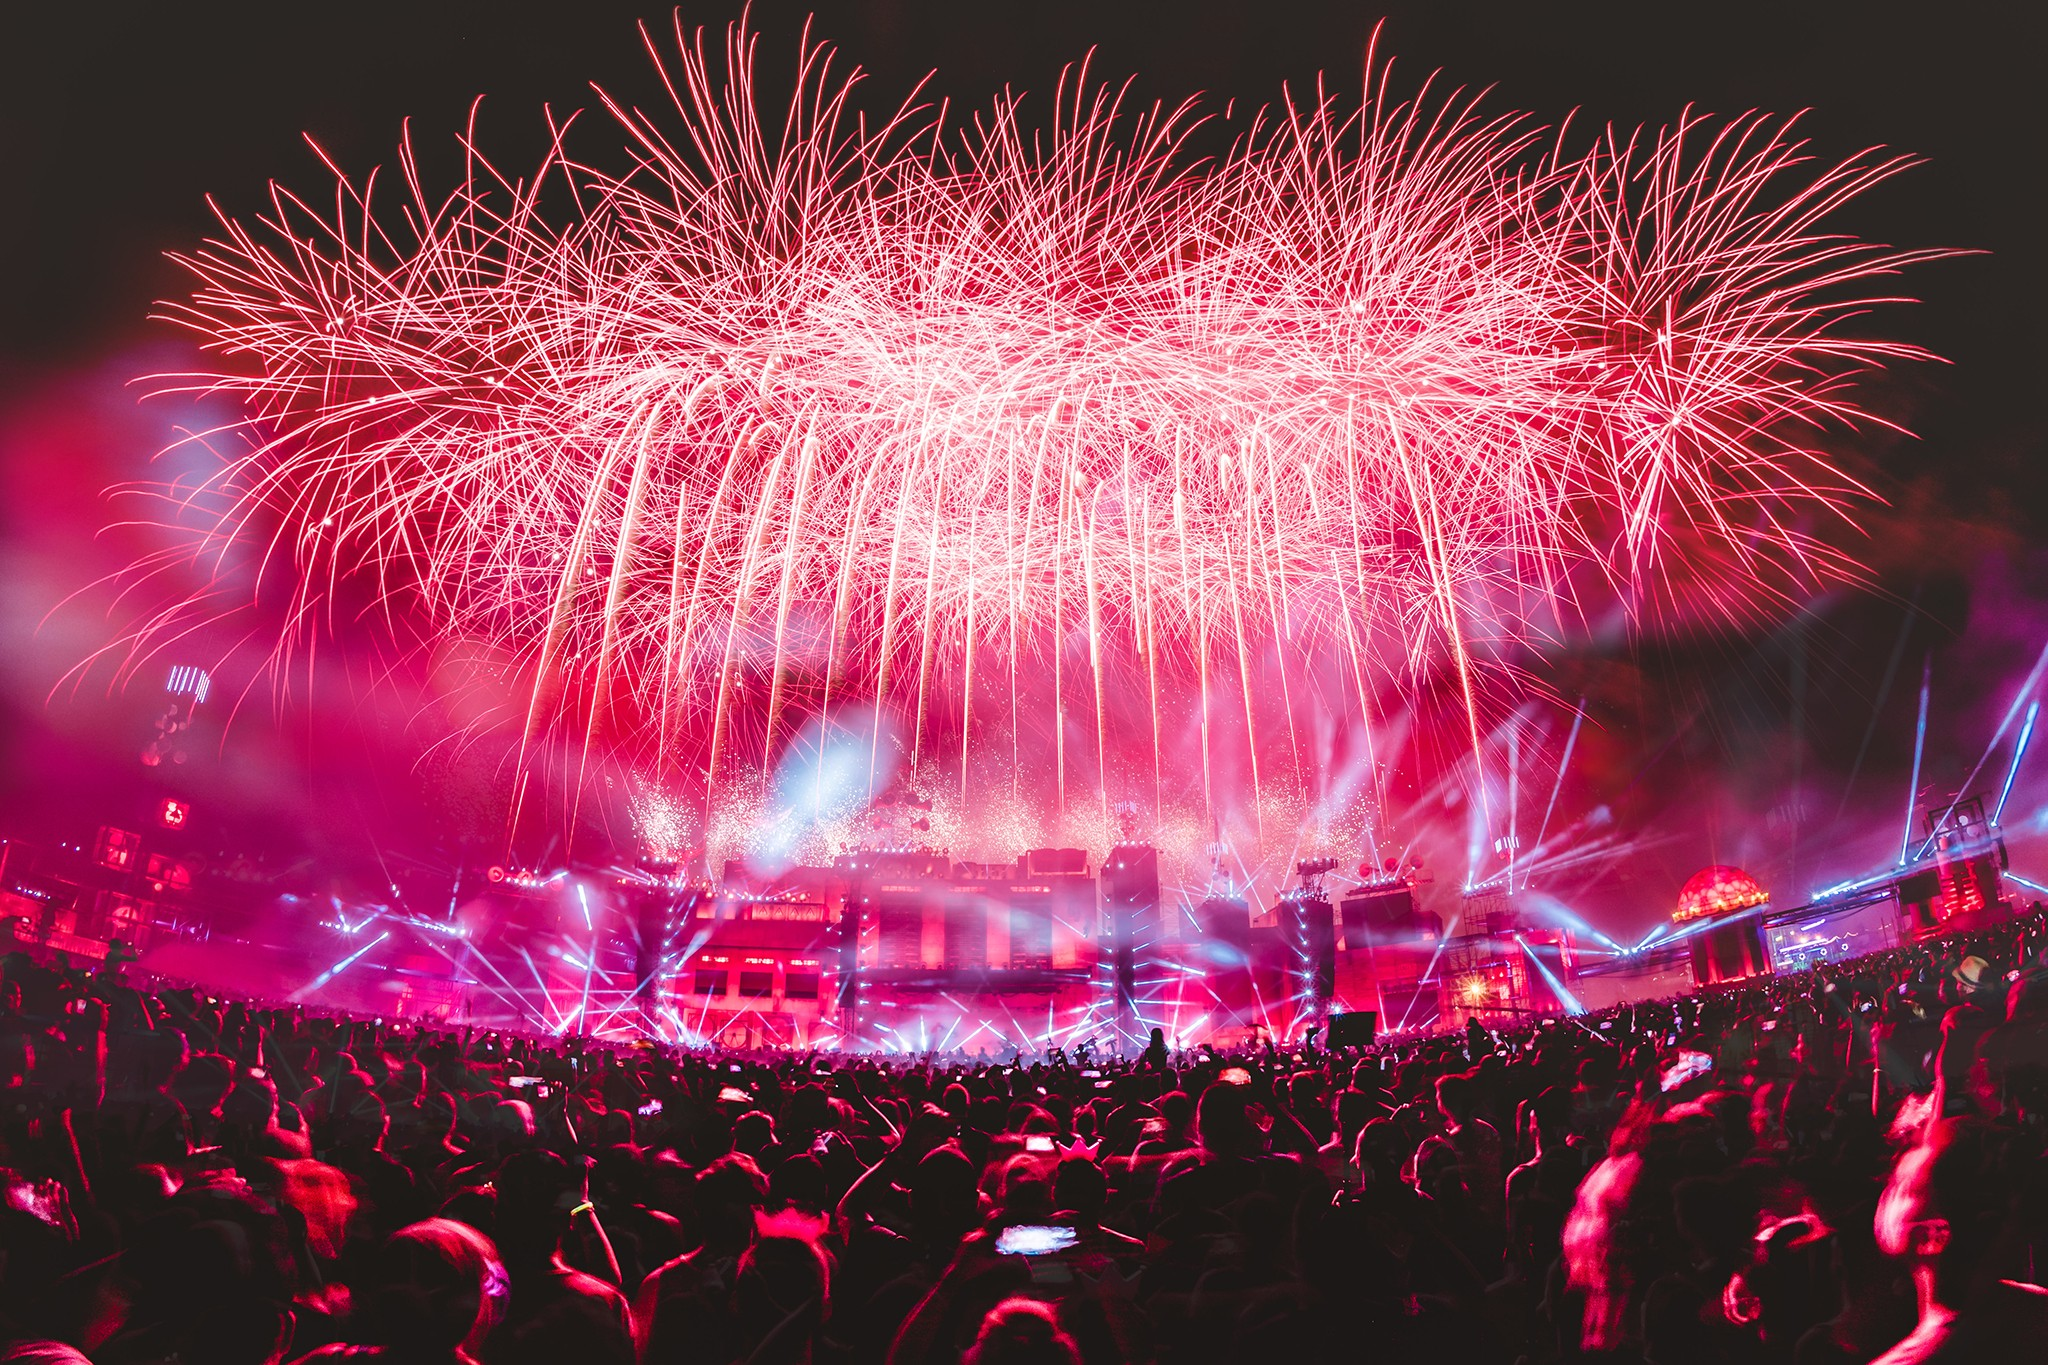 PV18 mainstage fireworks night ©Julian Huke - Euer Festival-Sommer Teil 2 + Verlosungen!!